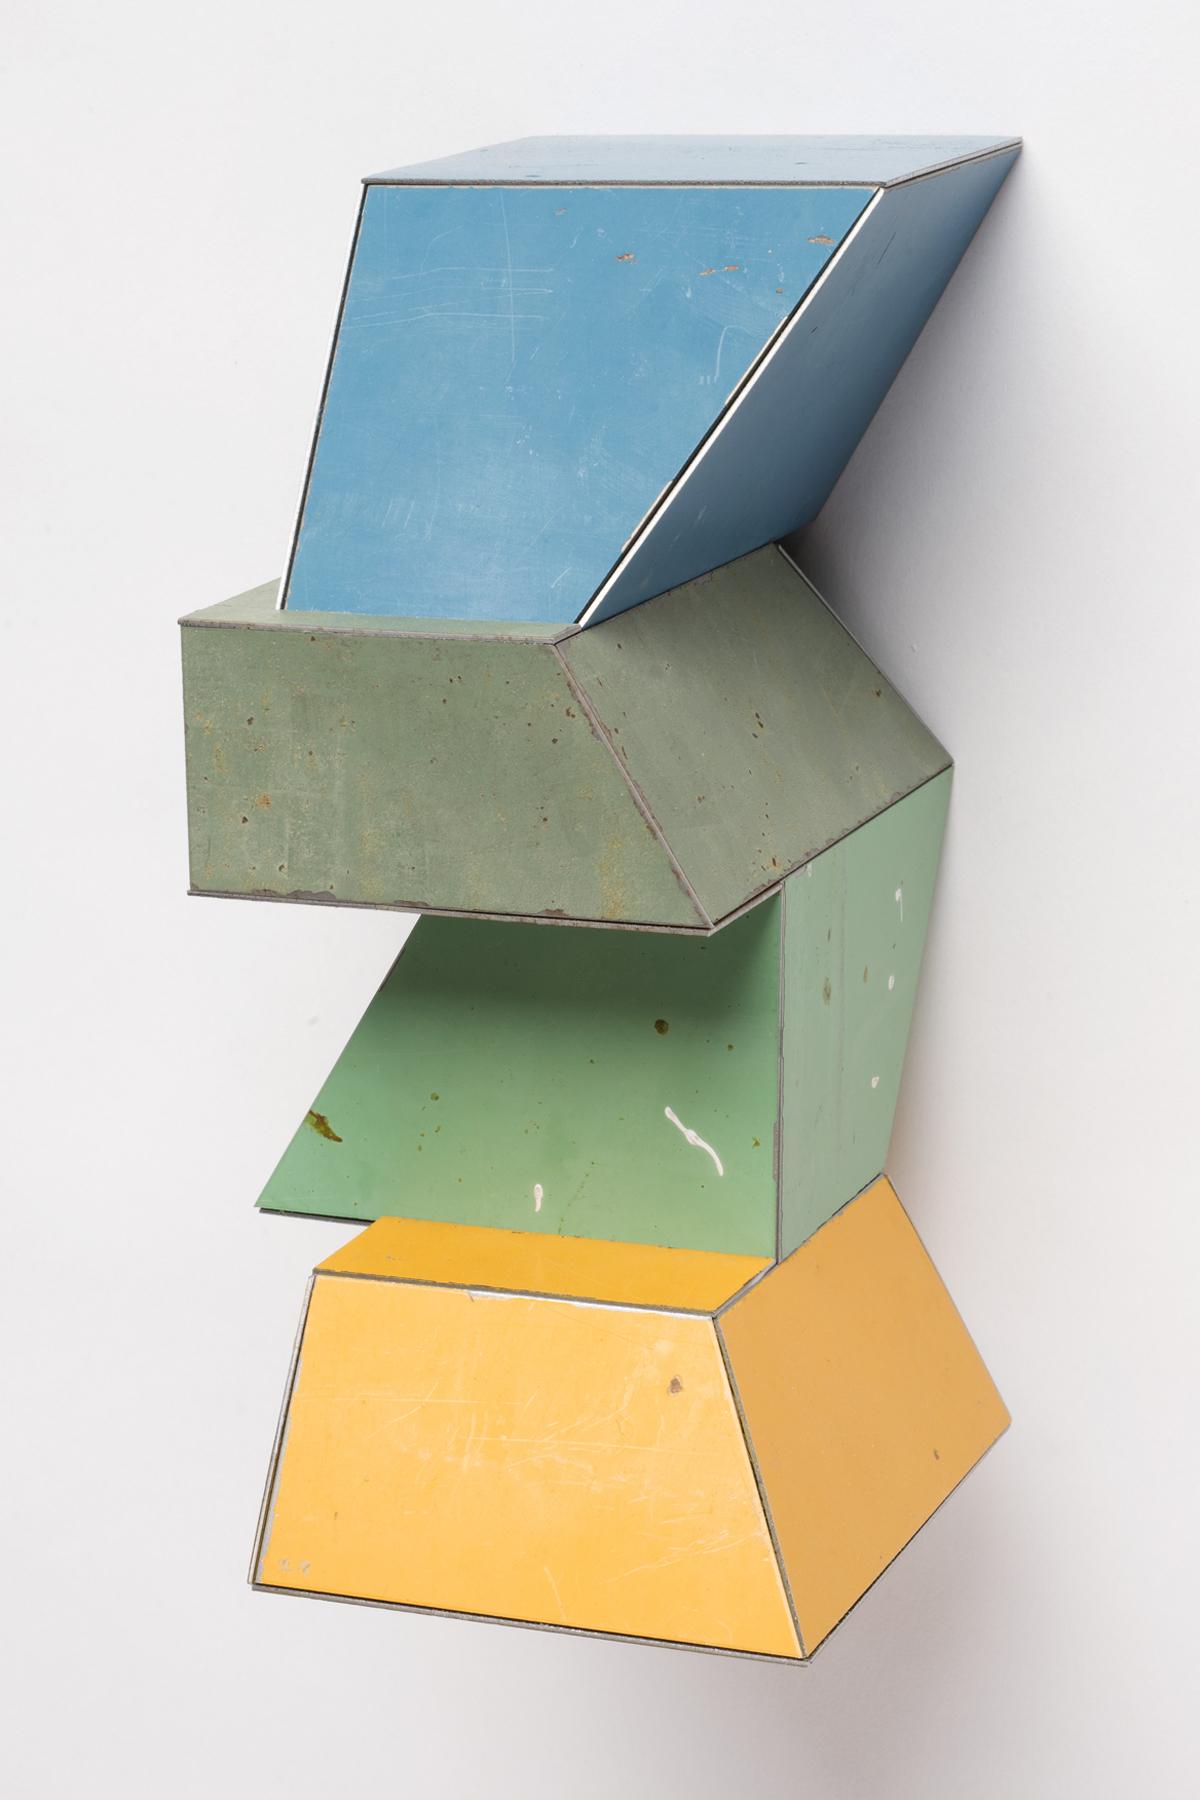 Major Minority, 7.5 x 4 x 4.25 inches / 19 x 10.2 x 10.8 cm, salvage steel, marine-grade plywood, silicone, vulcanized rubber, hardware, 2018